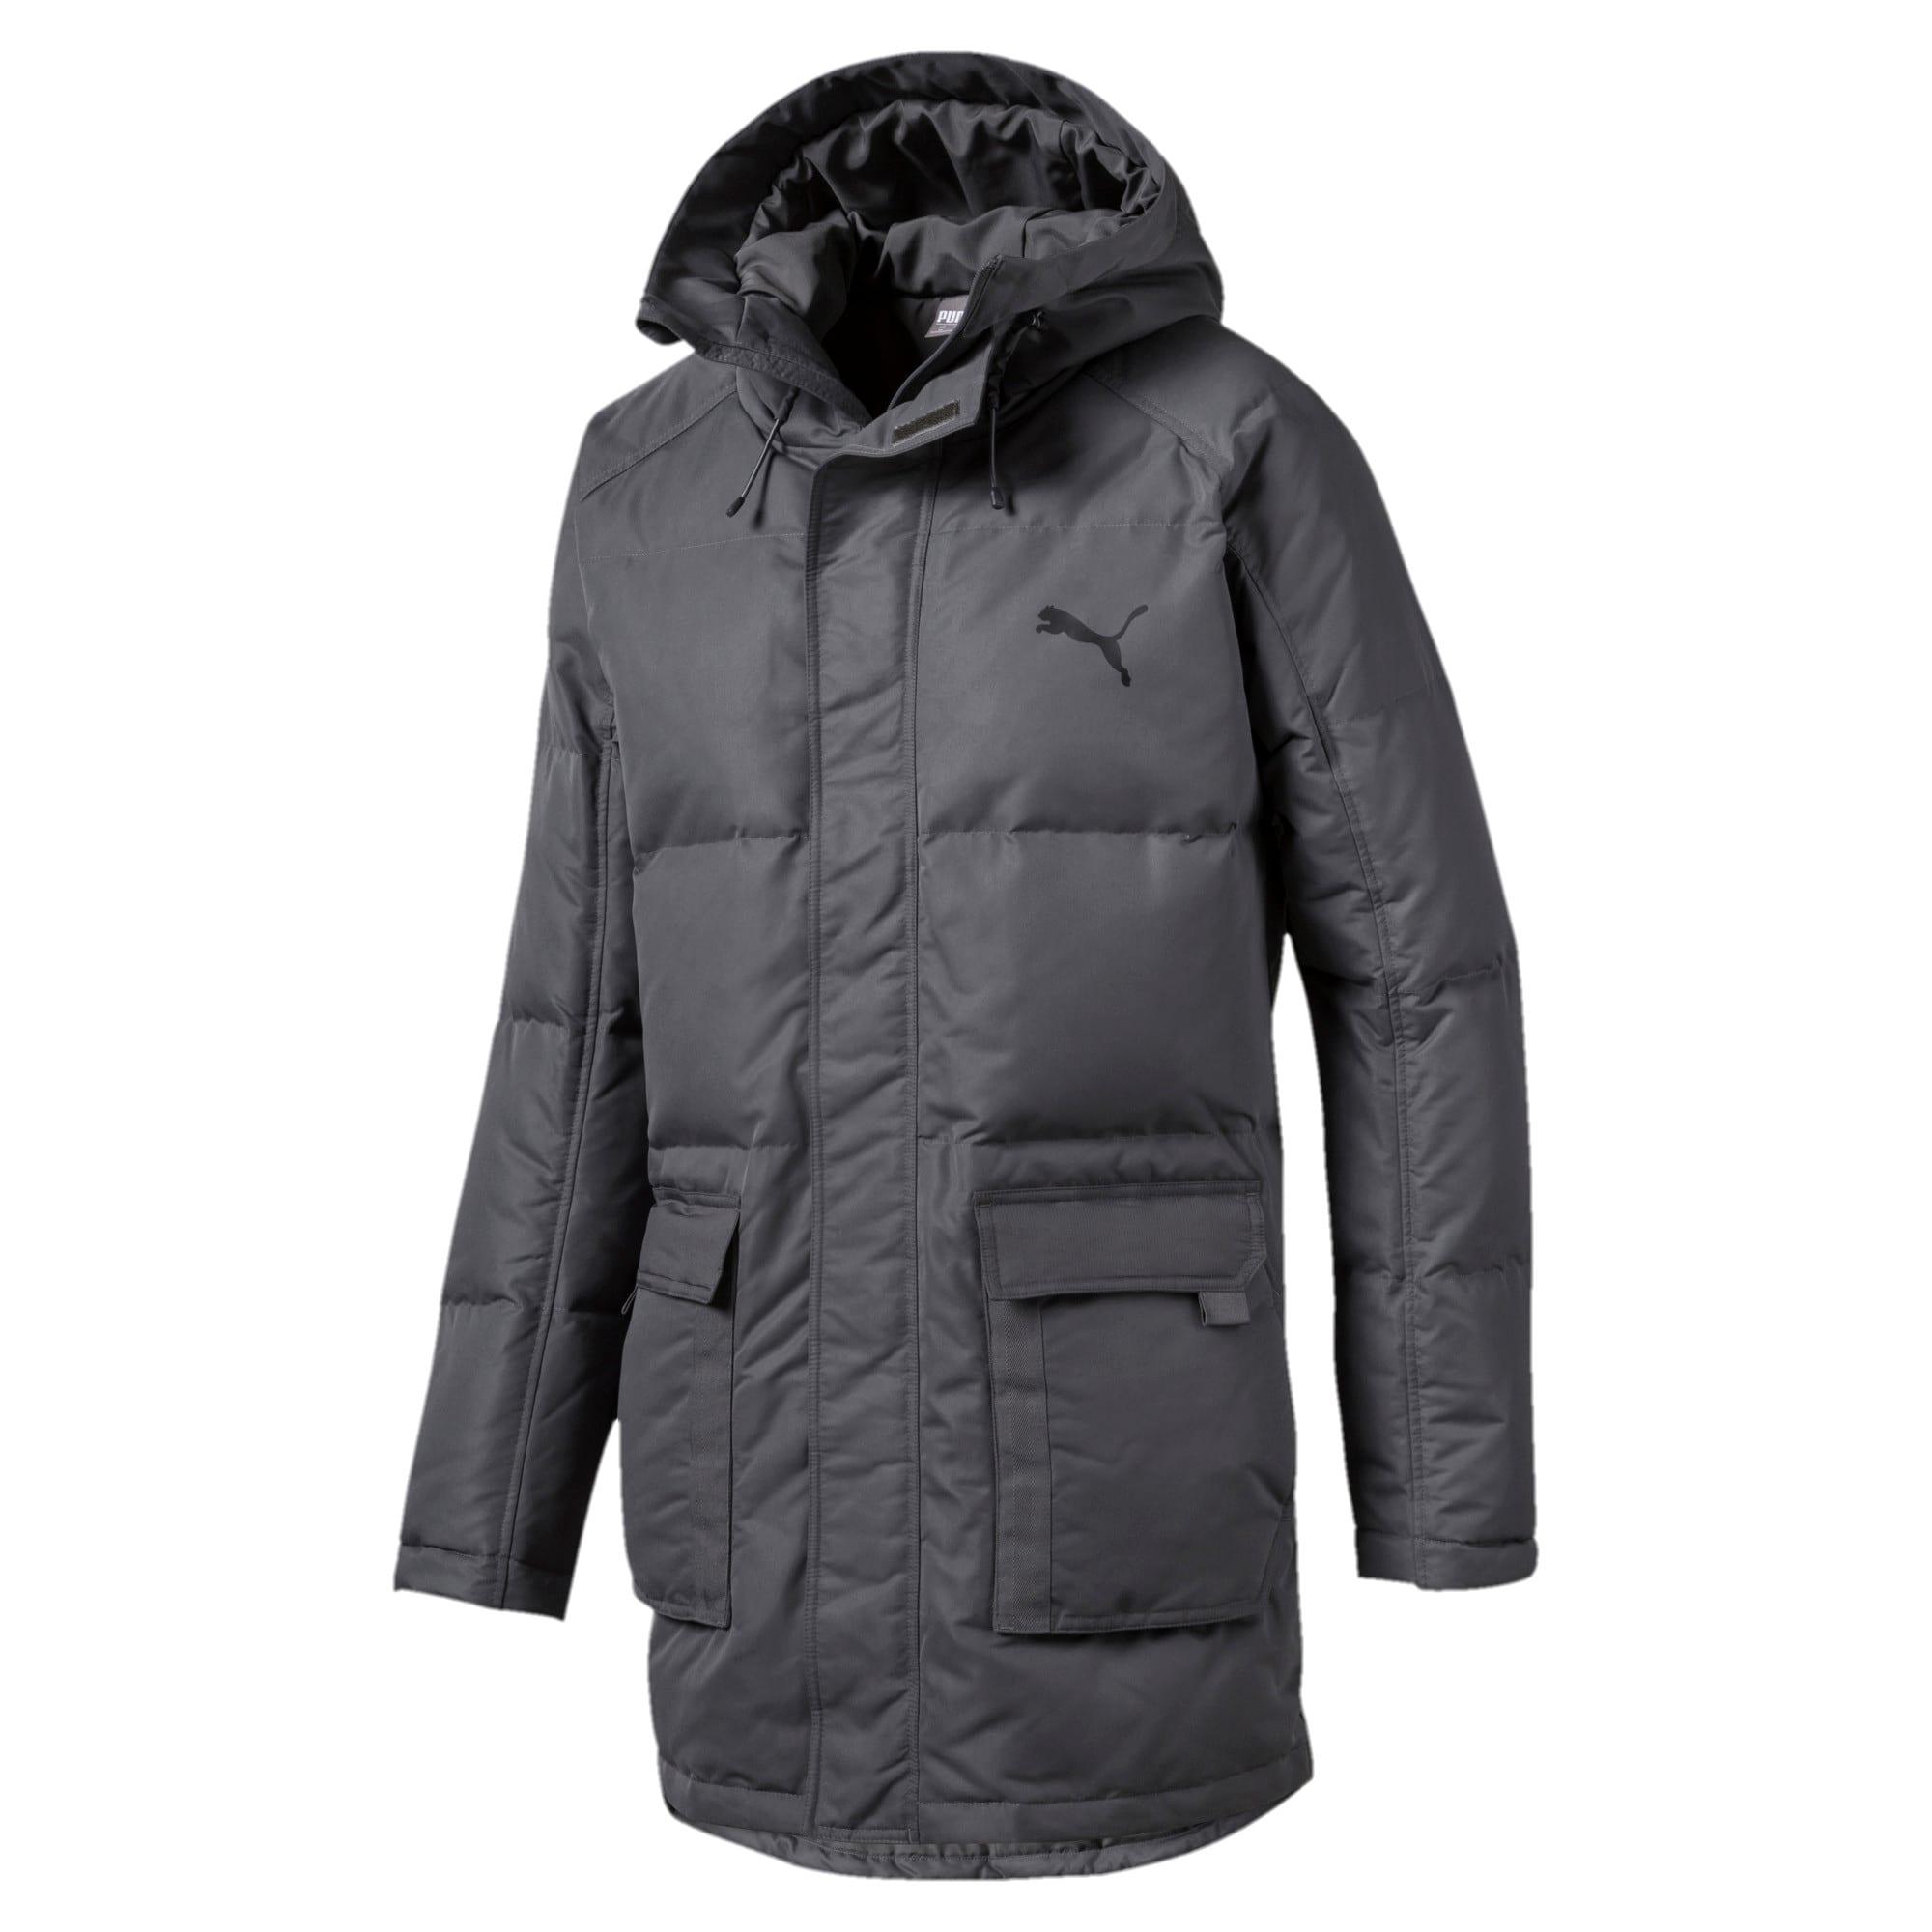 Thumbnail 4 of Oversize 500 Down Hooded Men's Jacket, CASTLEROCK, medium